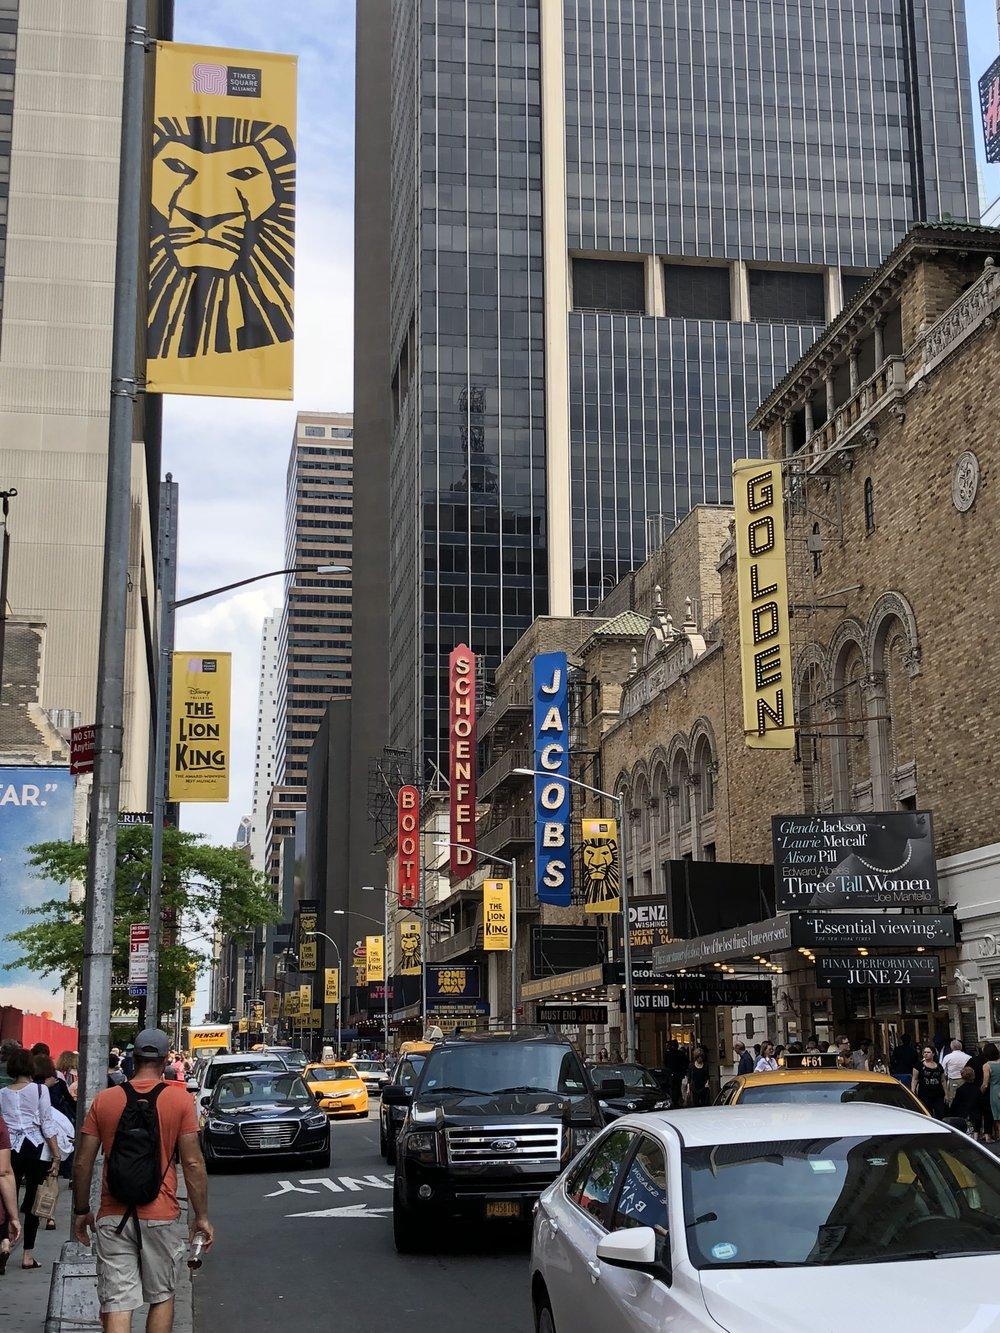 Image taken by Samantha McHenry, Broadway Theatres, 2018.